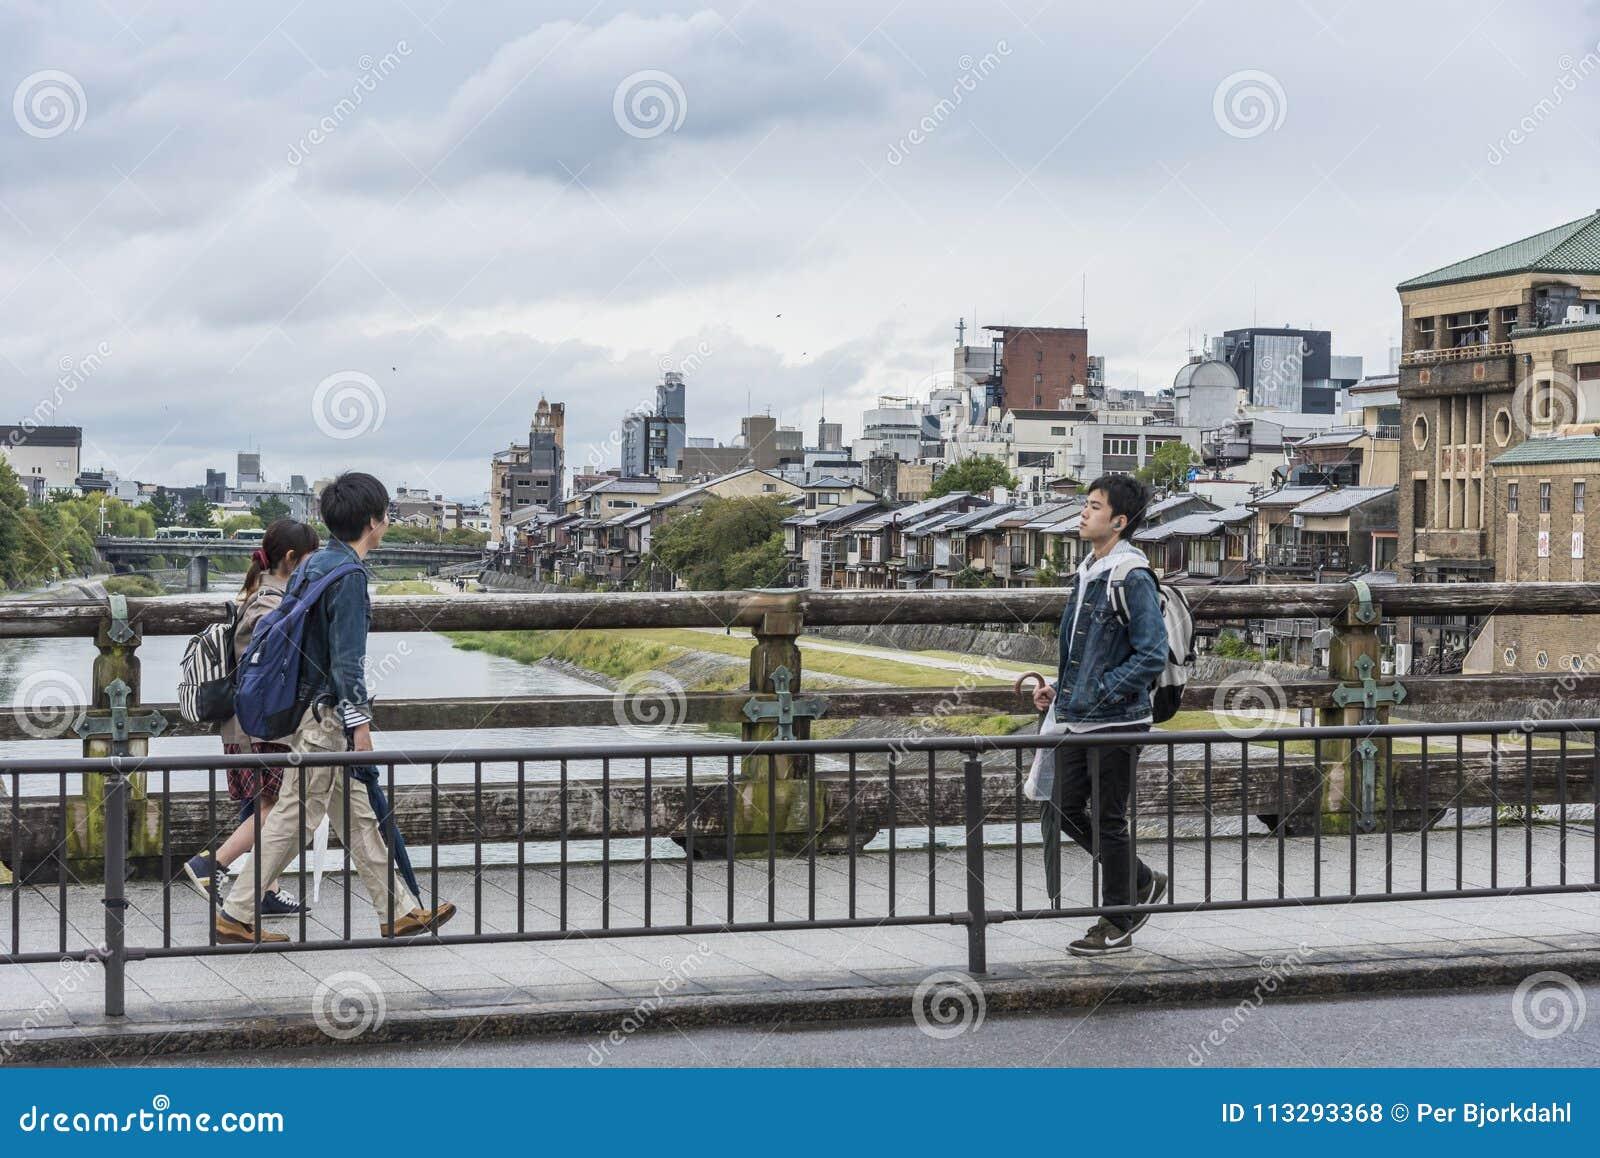 Pedestrians Sanjo dori bridge Kyoto Japan